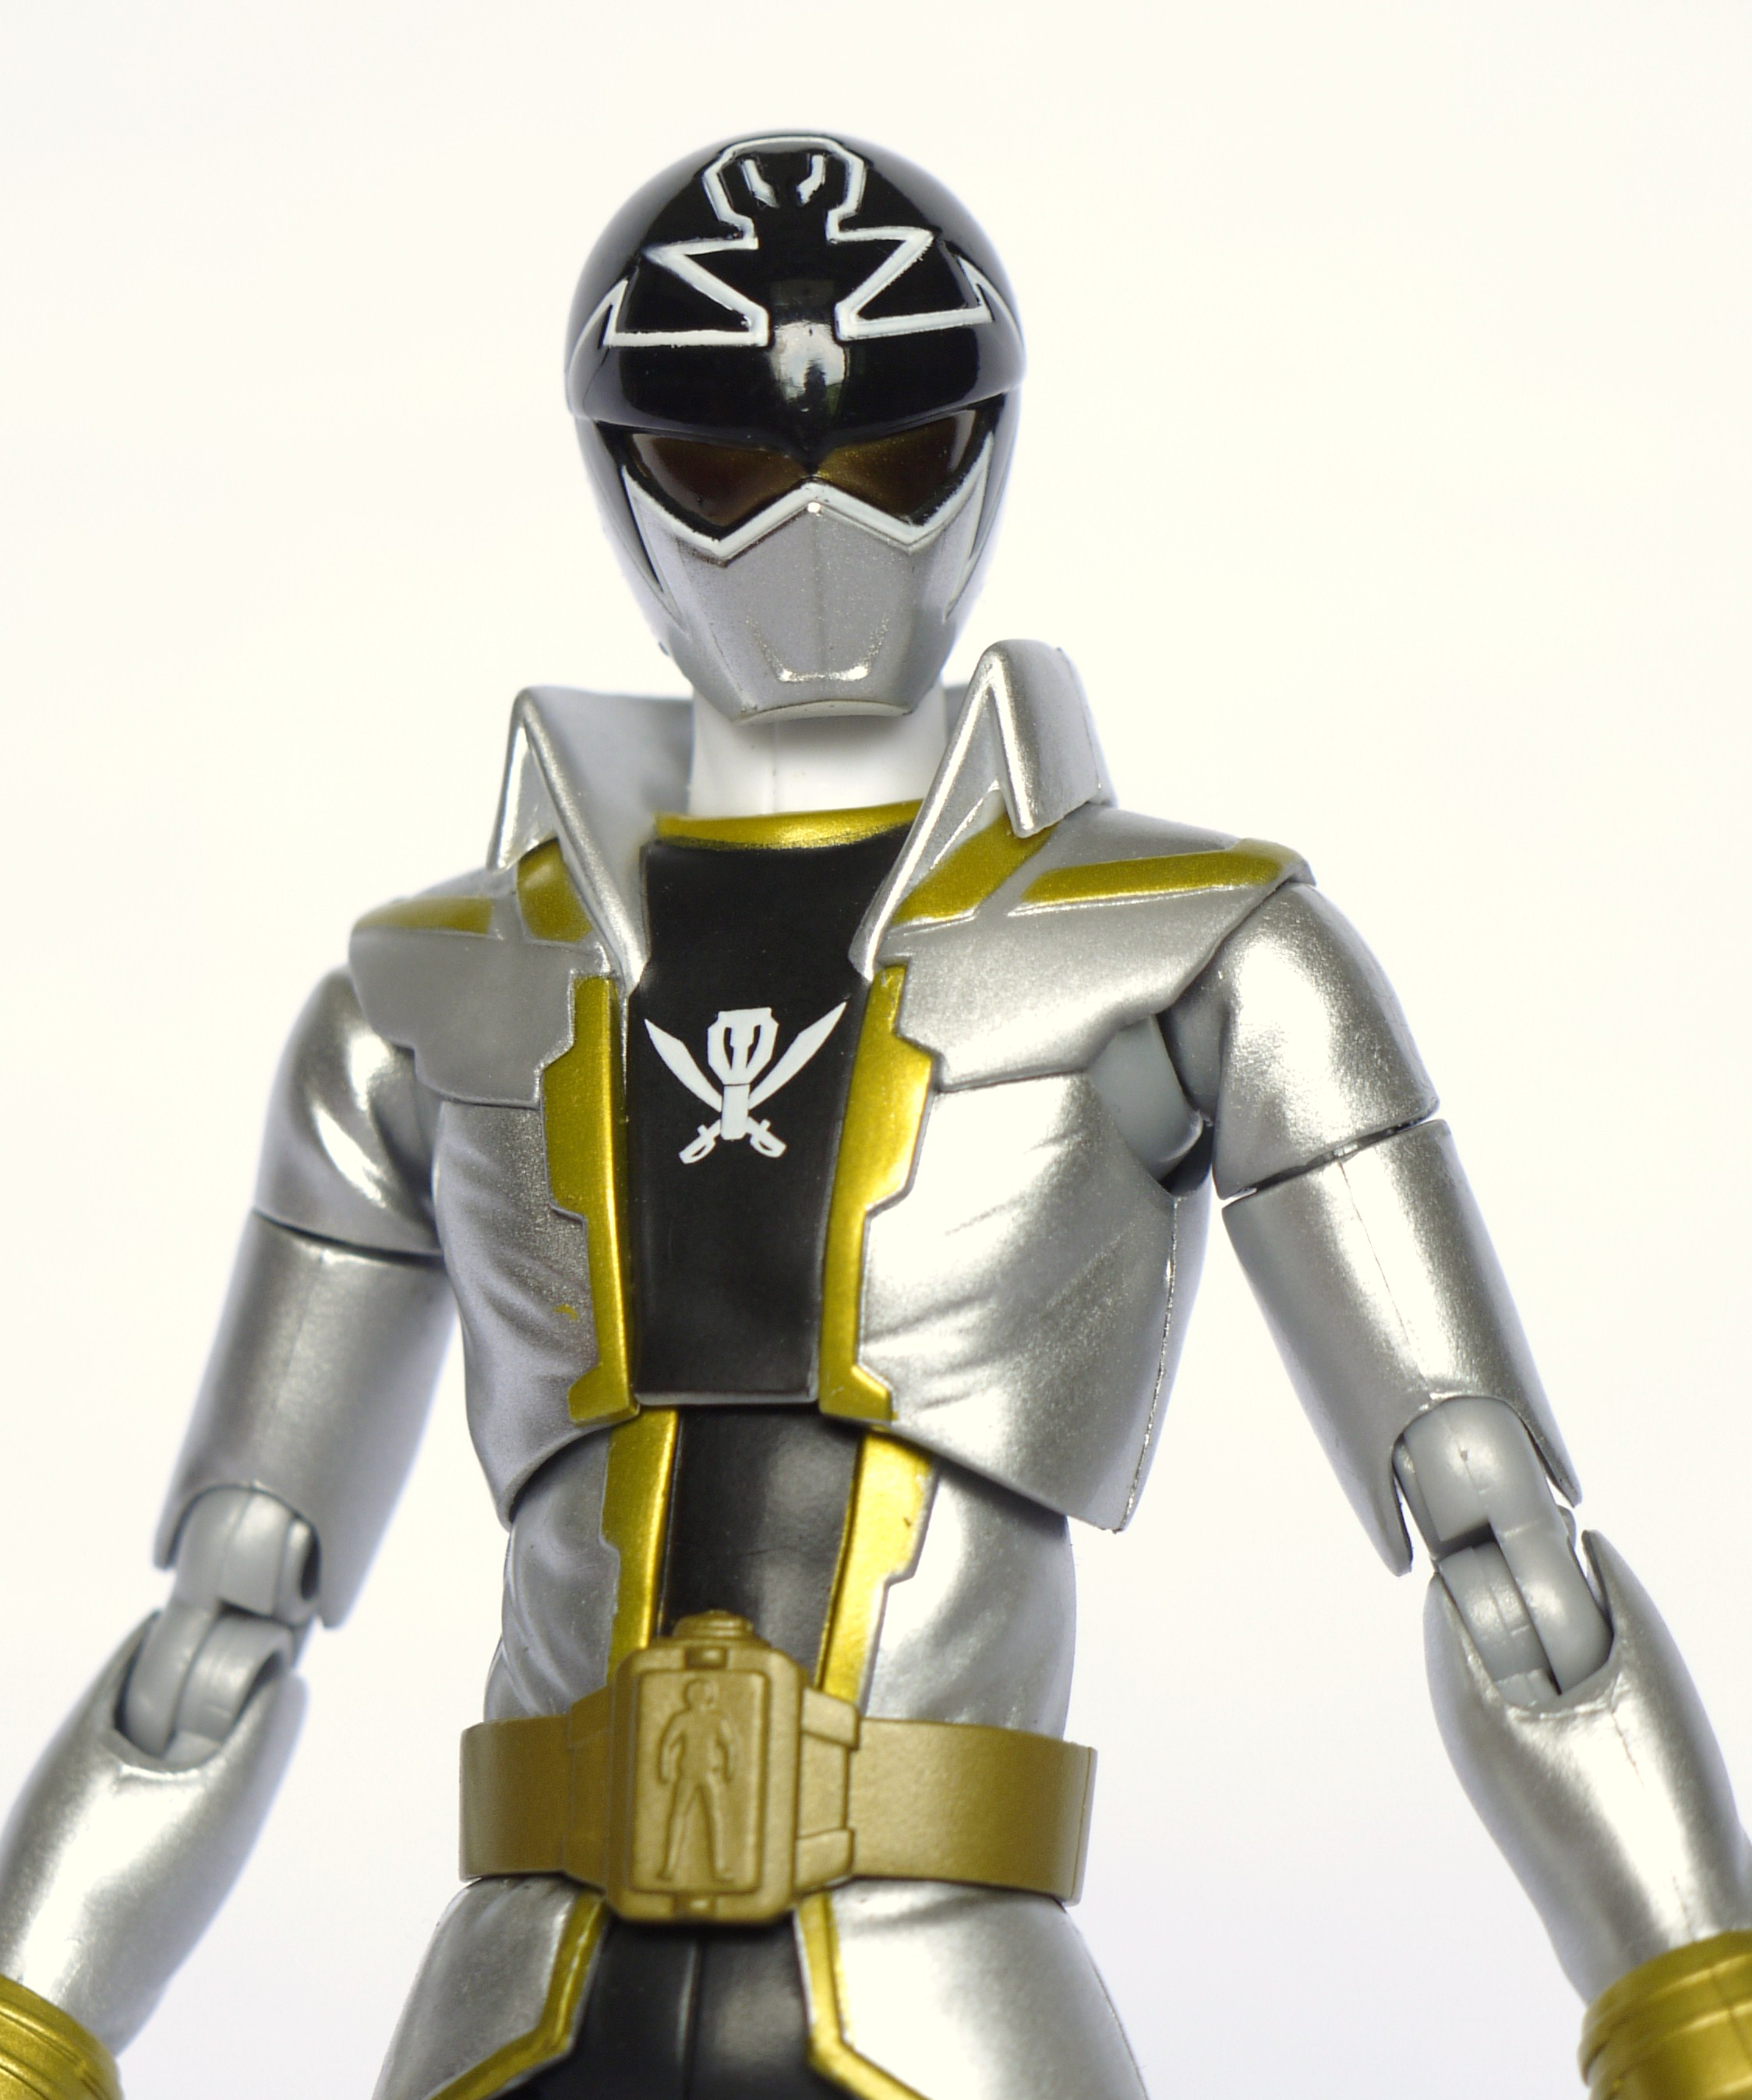 Gokai silver figuarts